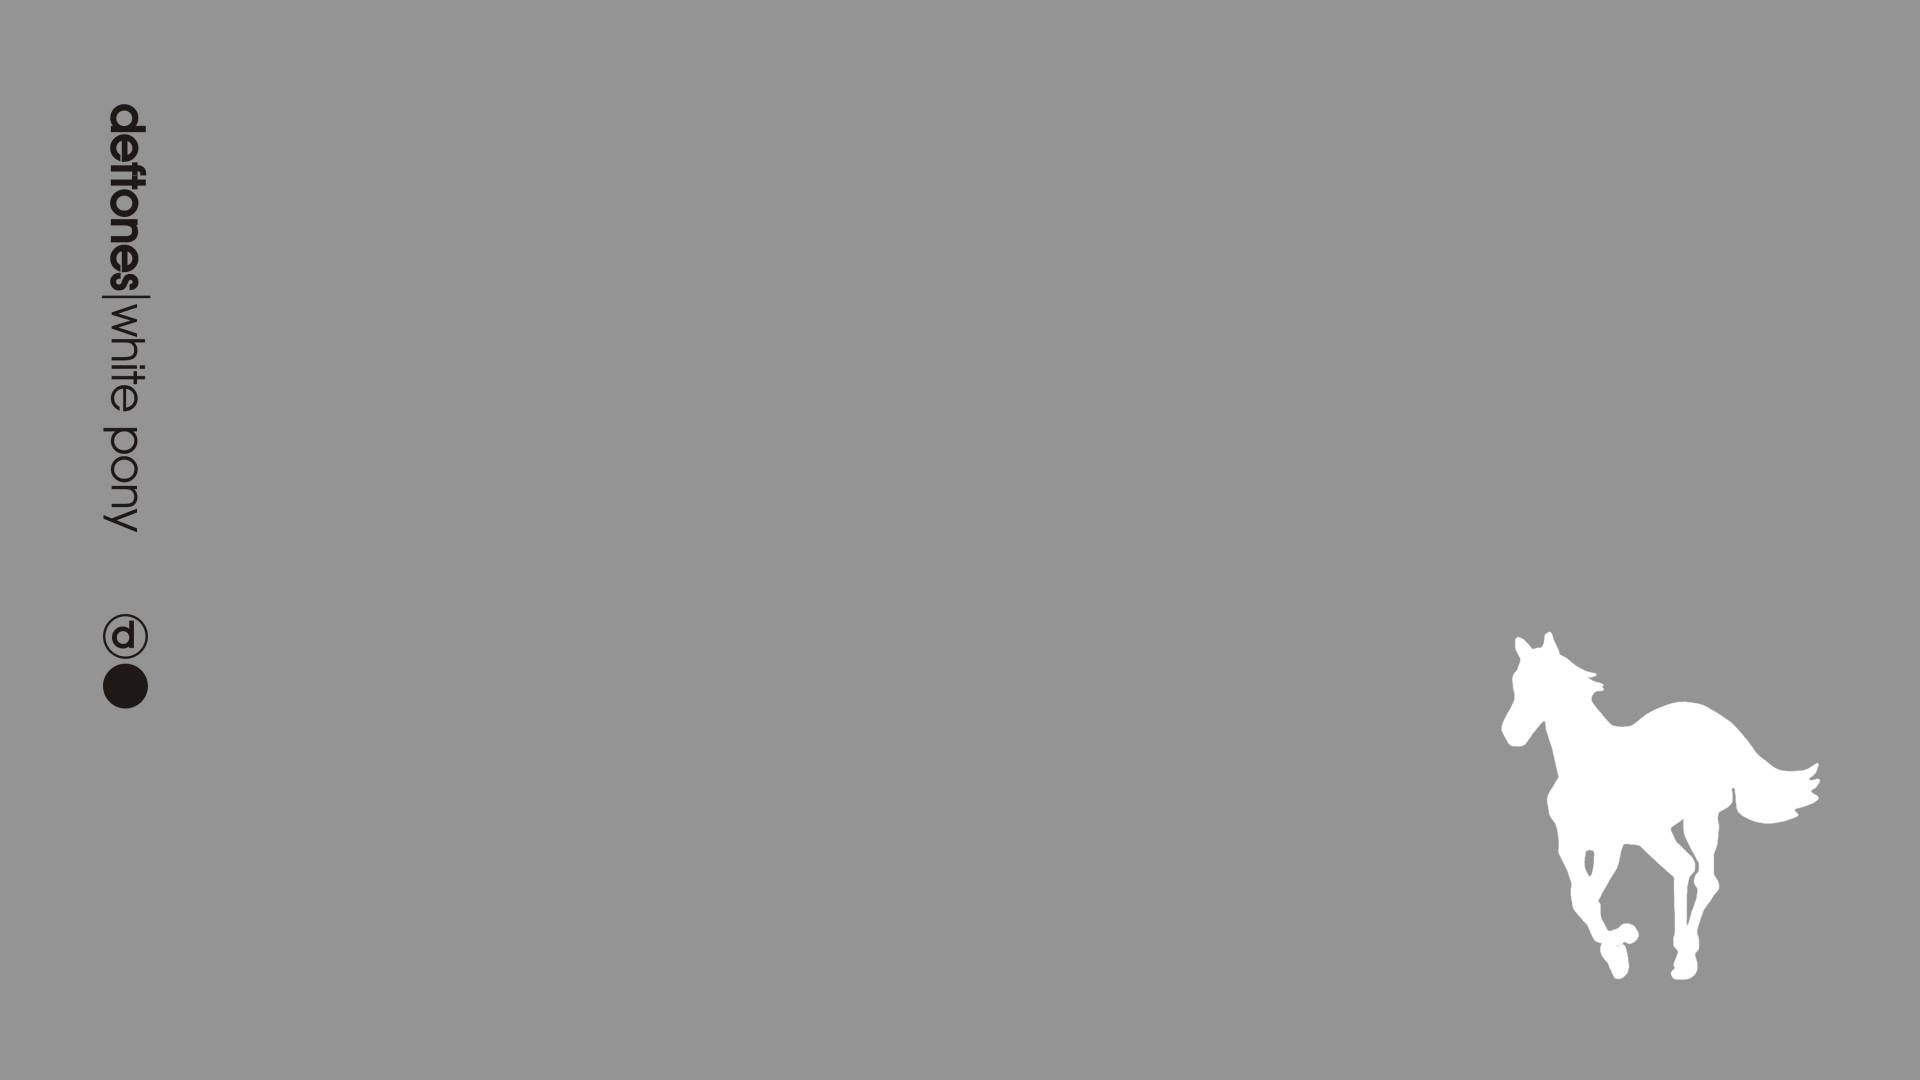 Res: 1920x1080, <b>deftones wallpaper</b> by sittingduck on DeviantArt   MELODIC ACID